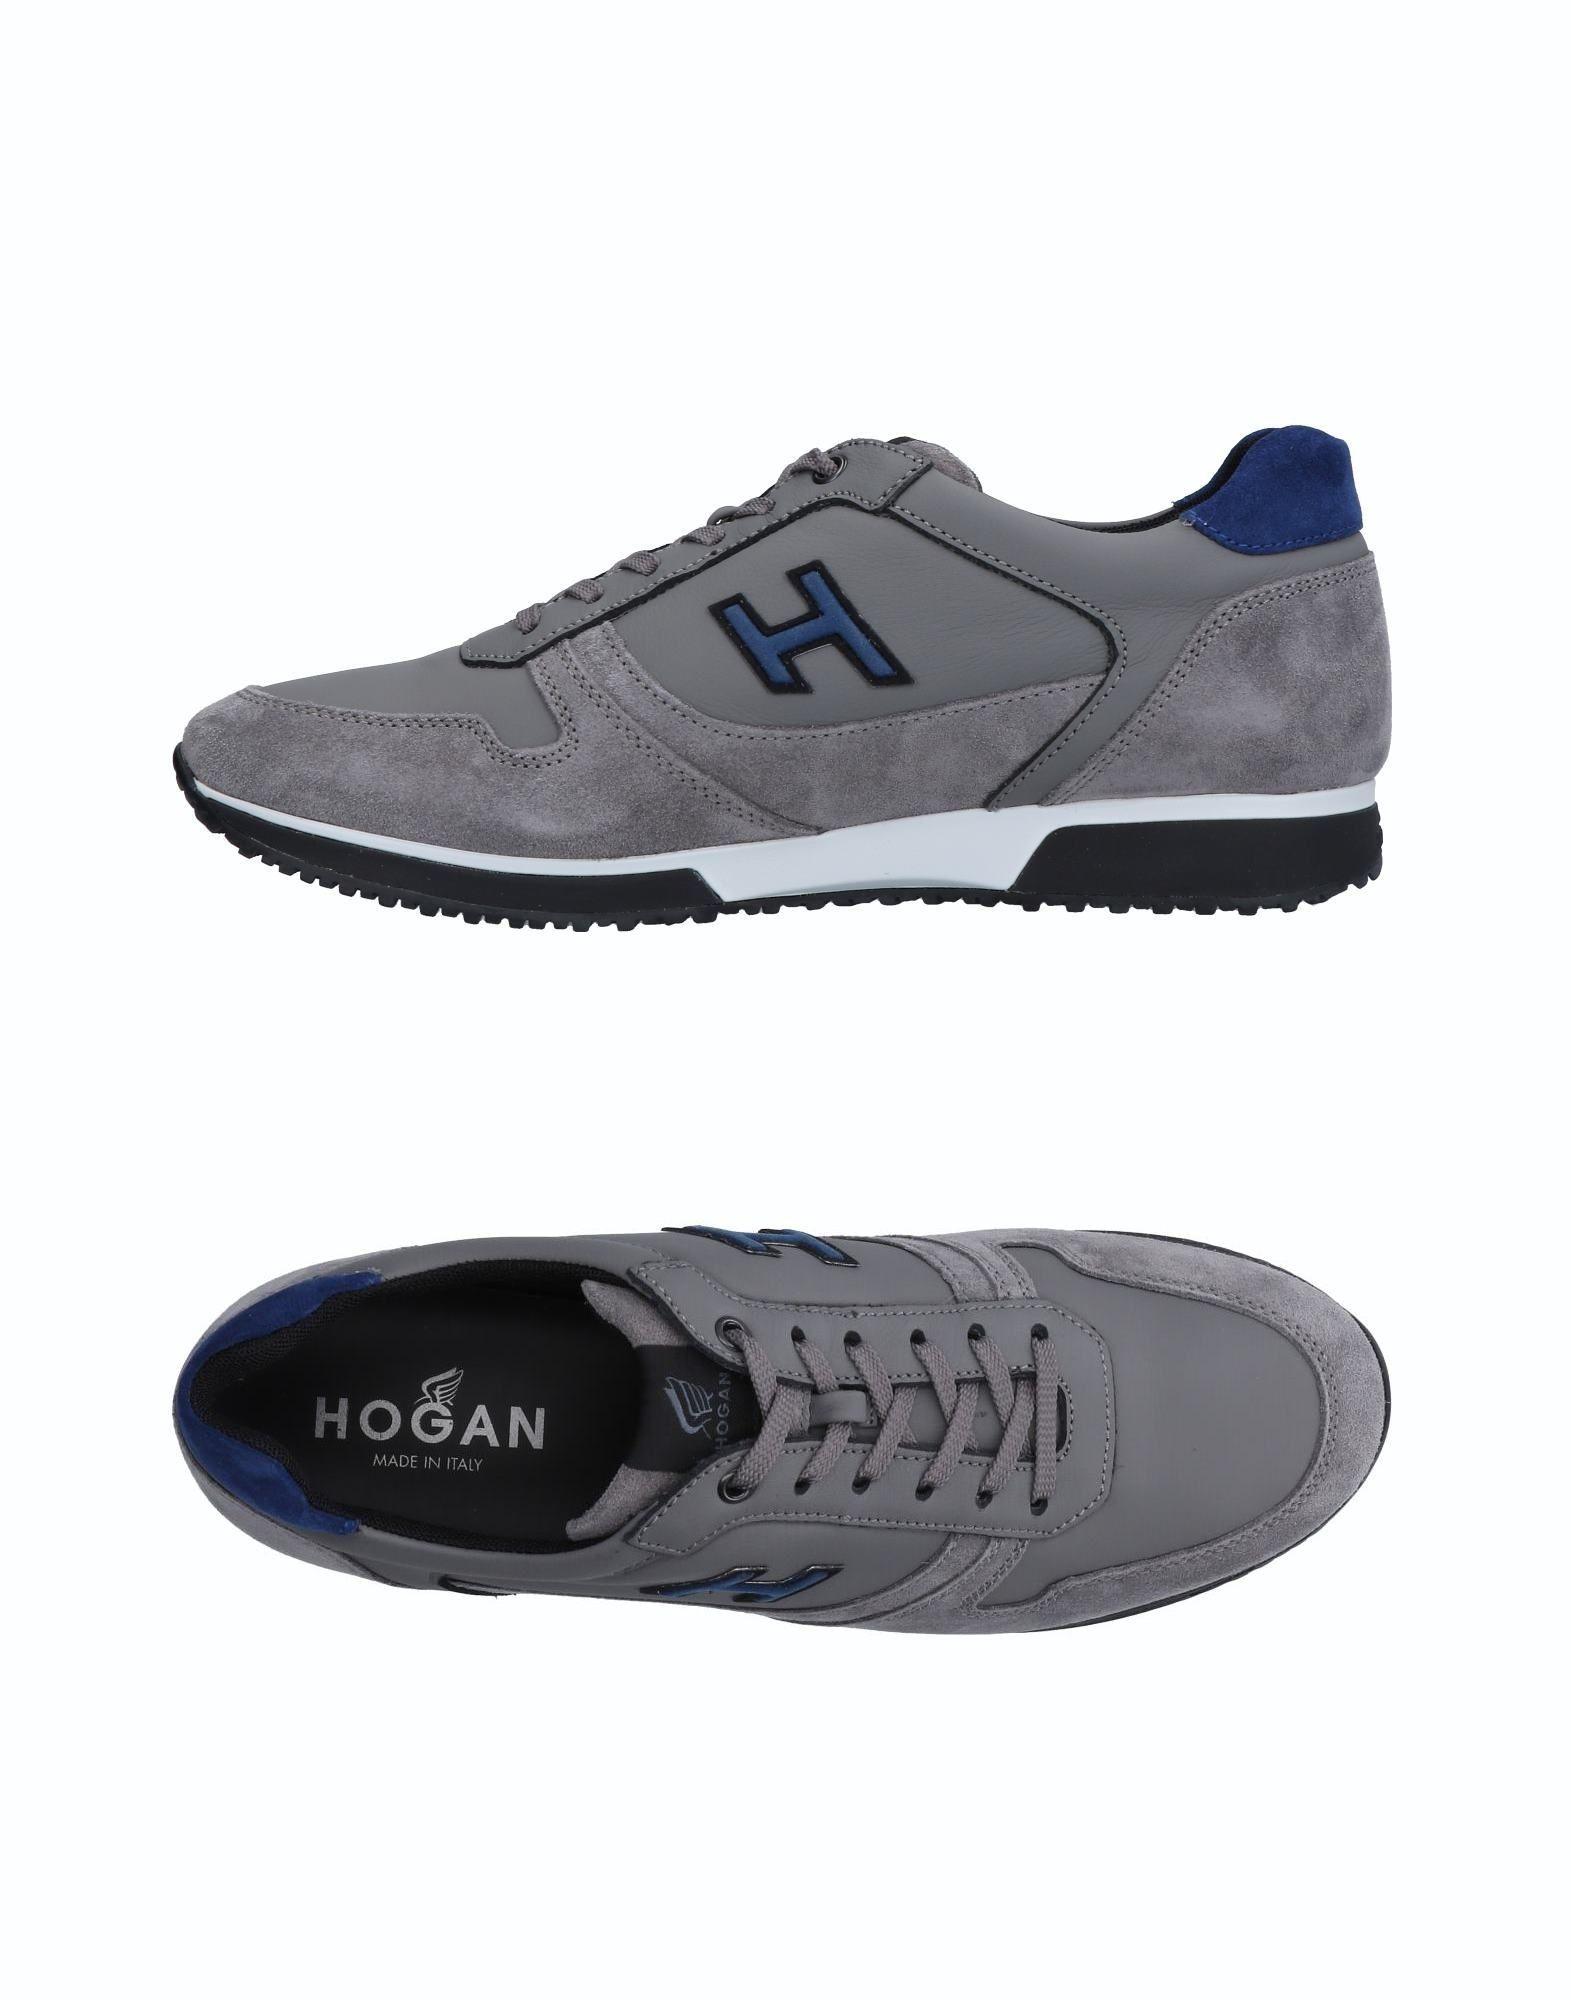 Moda Sneakers Hogan Uomo - 11515163PG